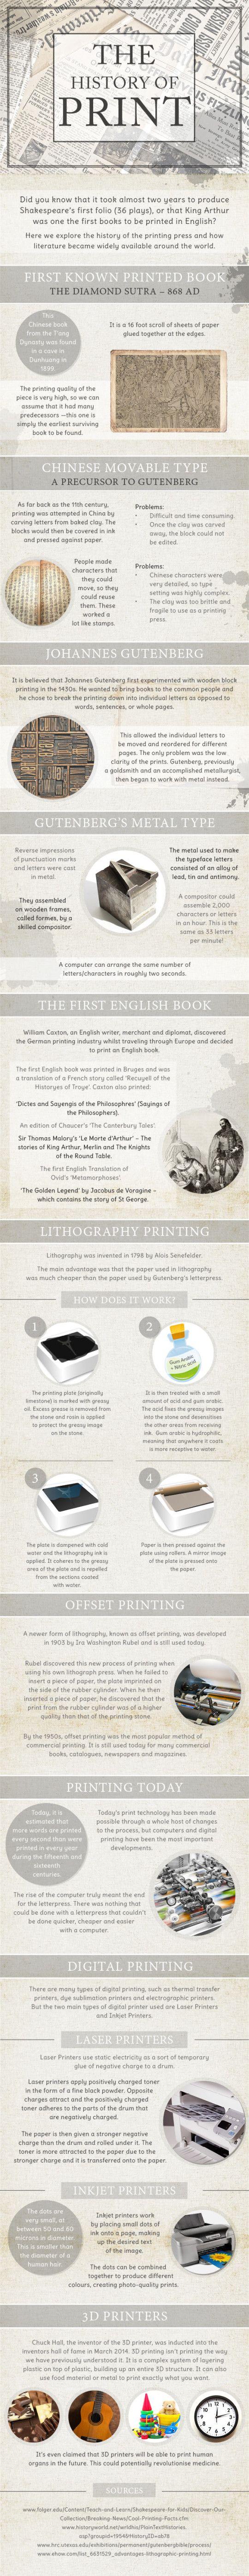 La historia del libro #libro #imprenta